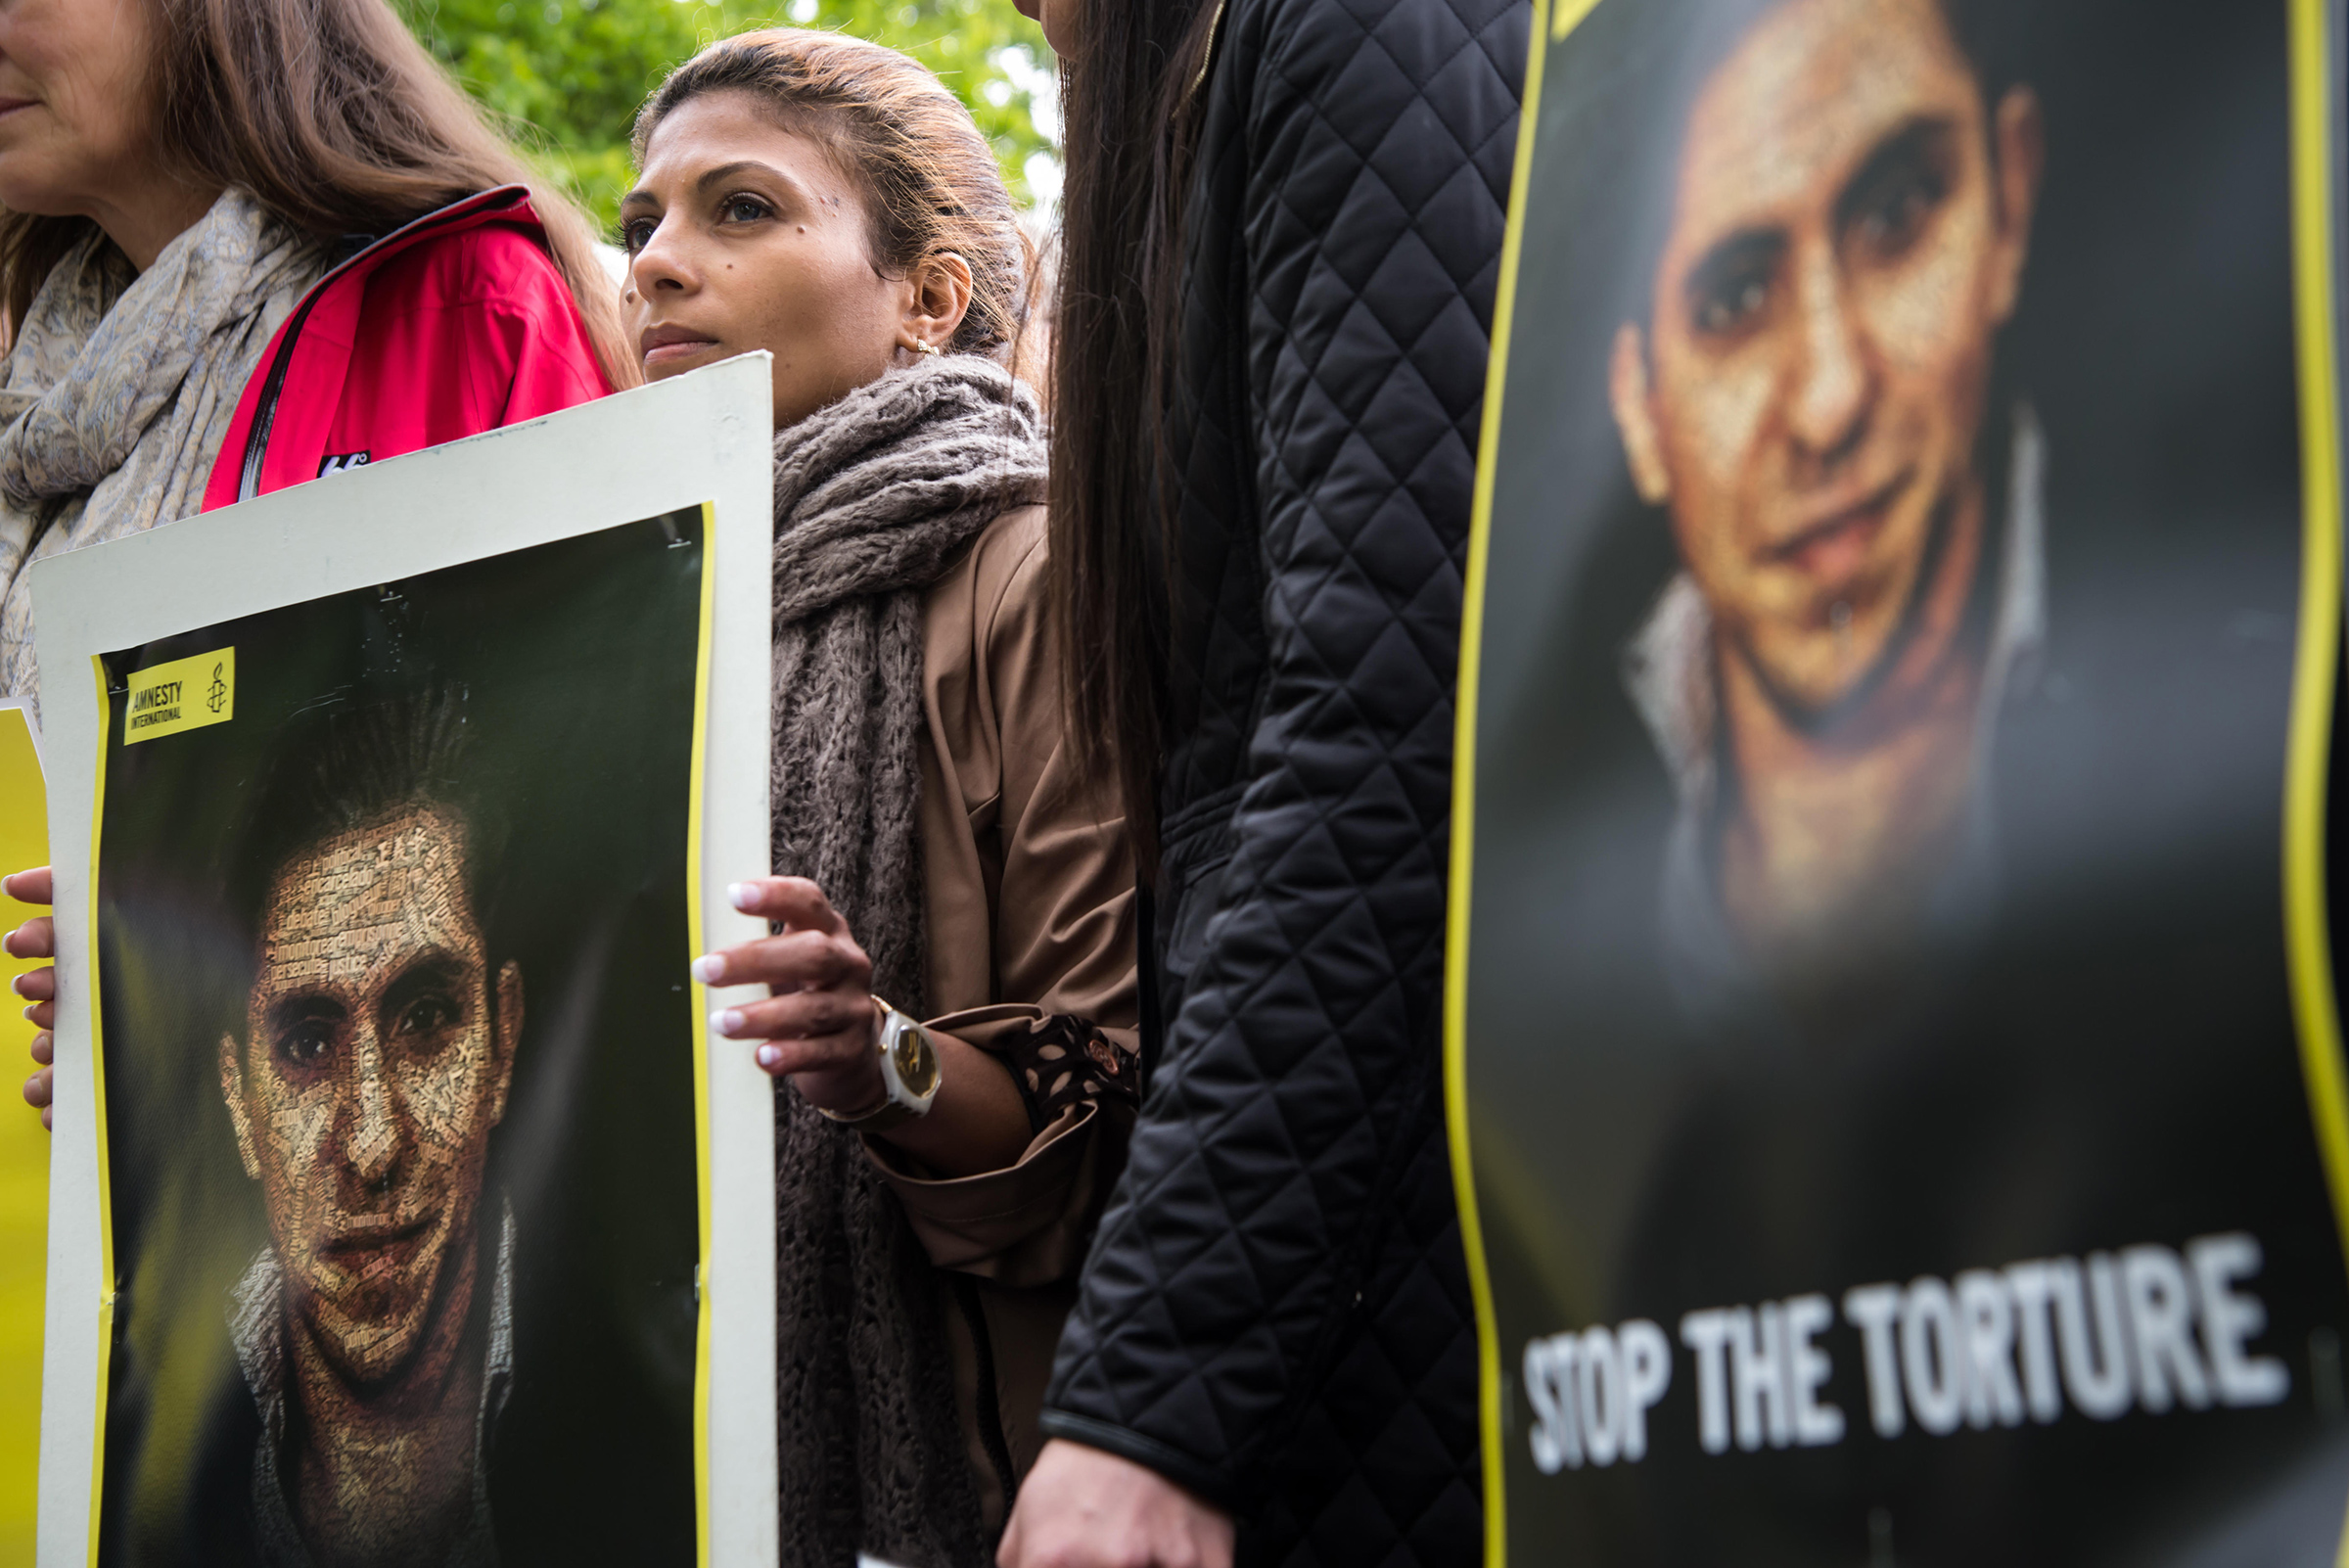 Ensaf Haidar, wife of imprisoned Saudi Arabian blogger Raif Badawi, protests for his release.